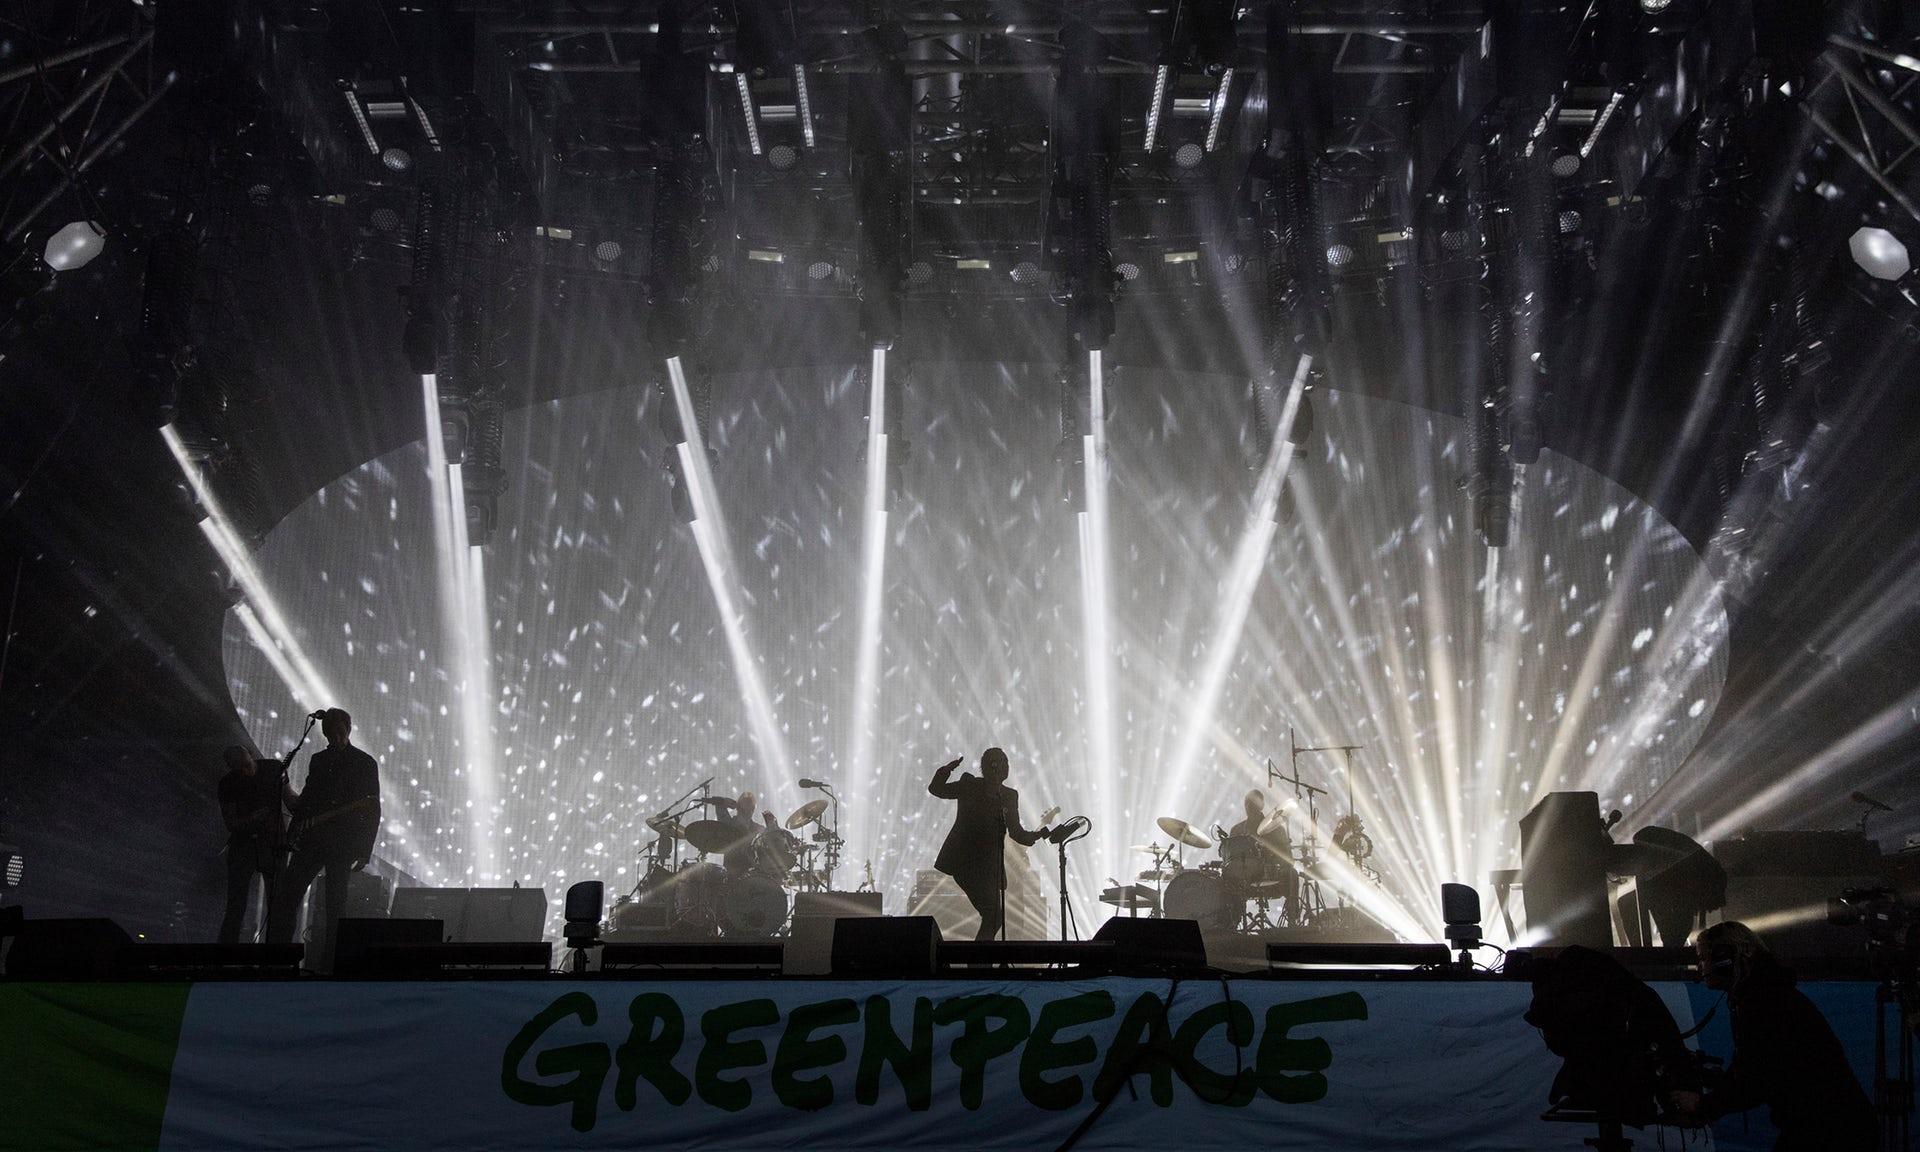 2. Radiohead - Photo Credit: The Guardian